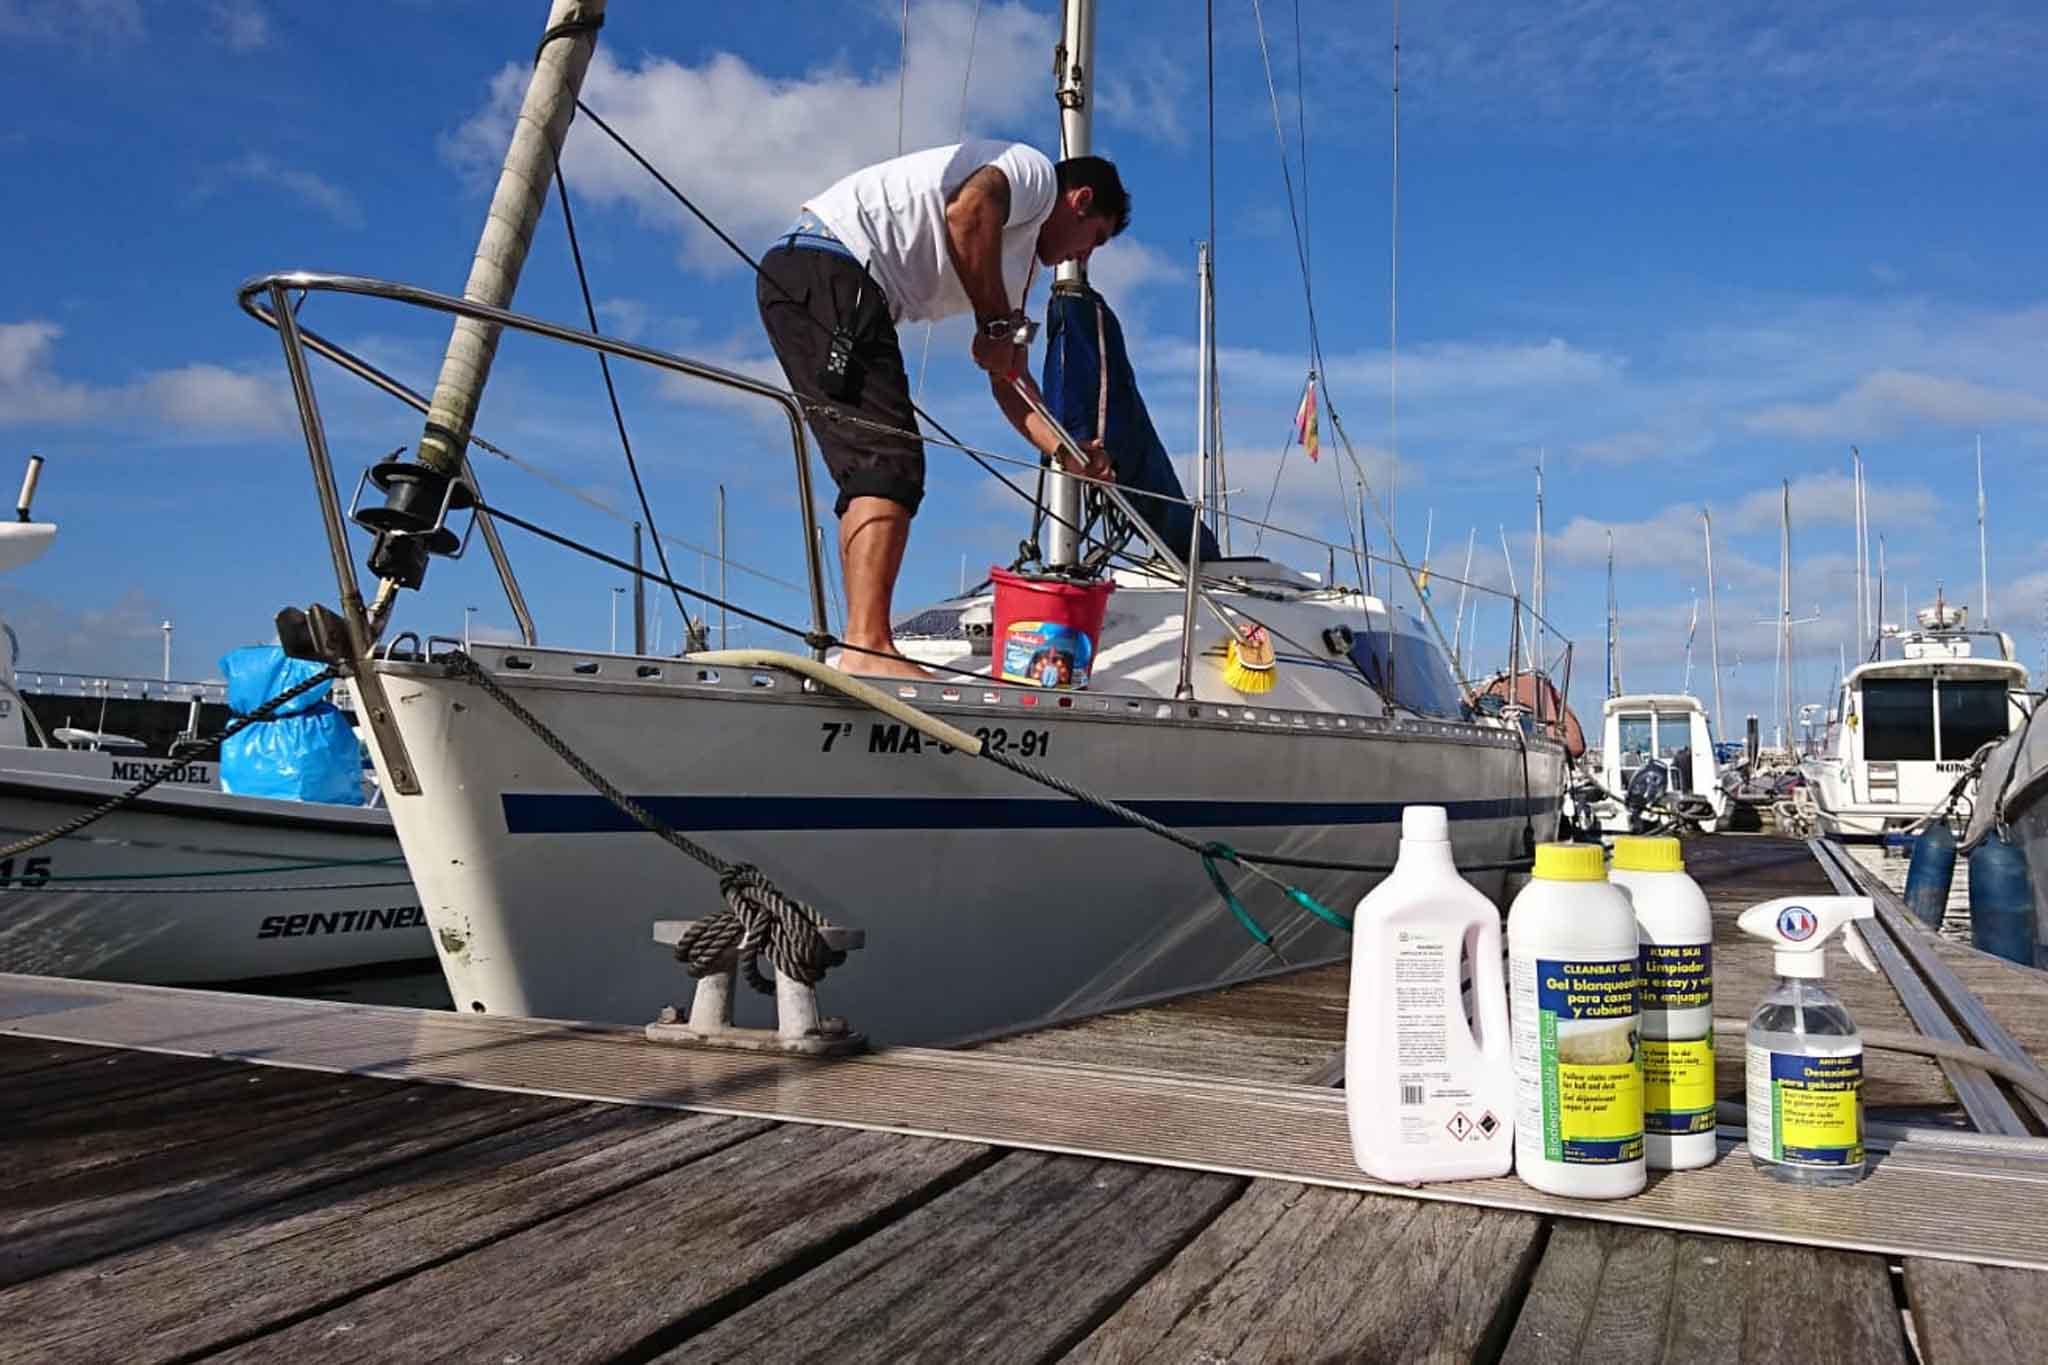 Alquiler Barco en Sitges 12